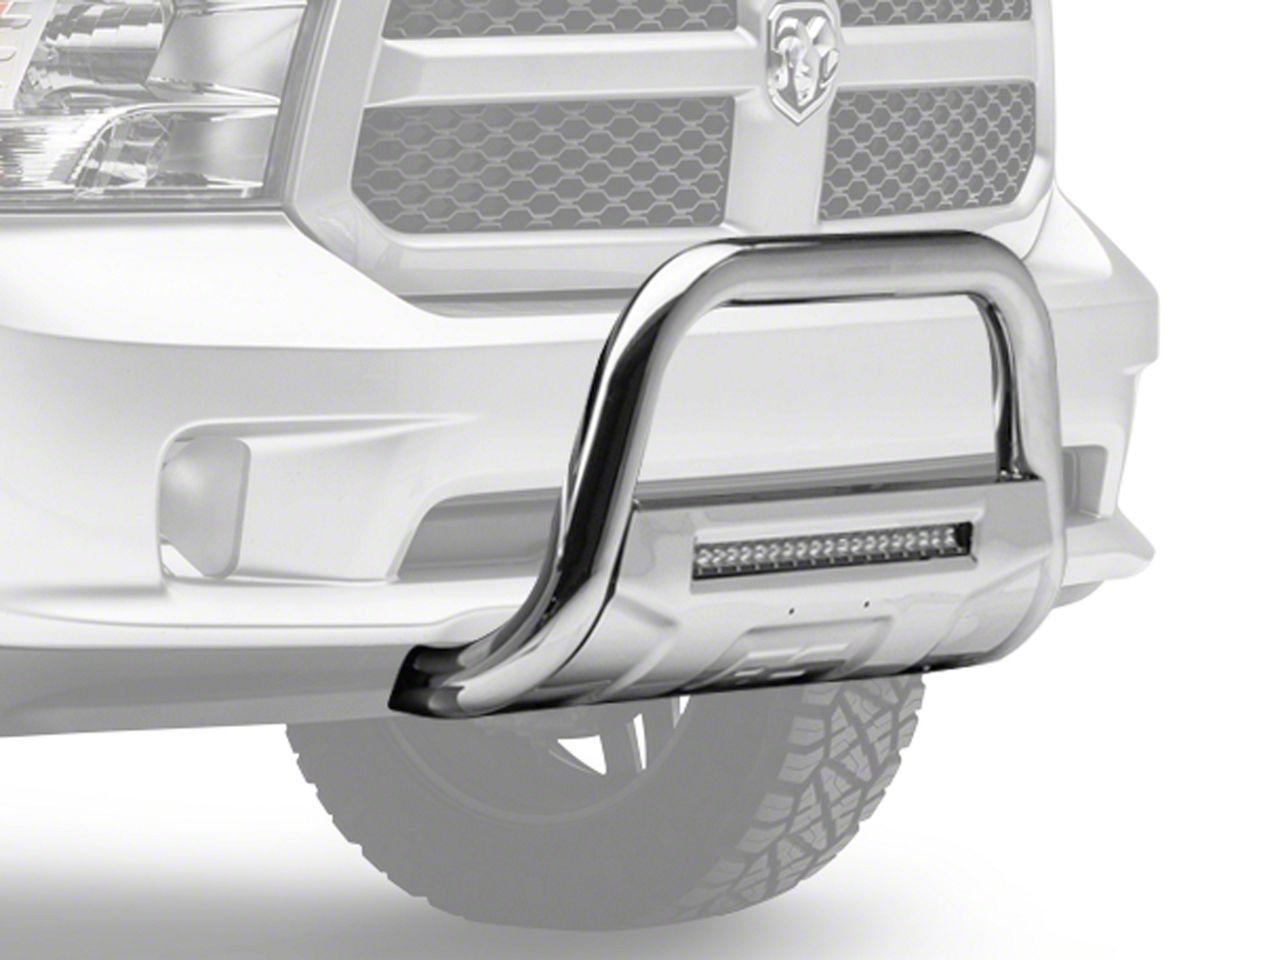 Rough Country Bull Bar w/ LED Light Bar - Stainless Steel (09-18 RAM 1500, Excluding Rebel)